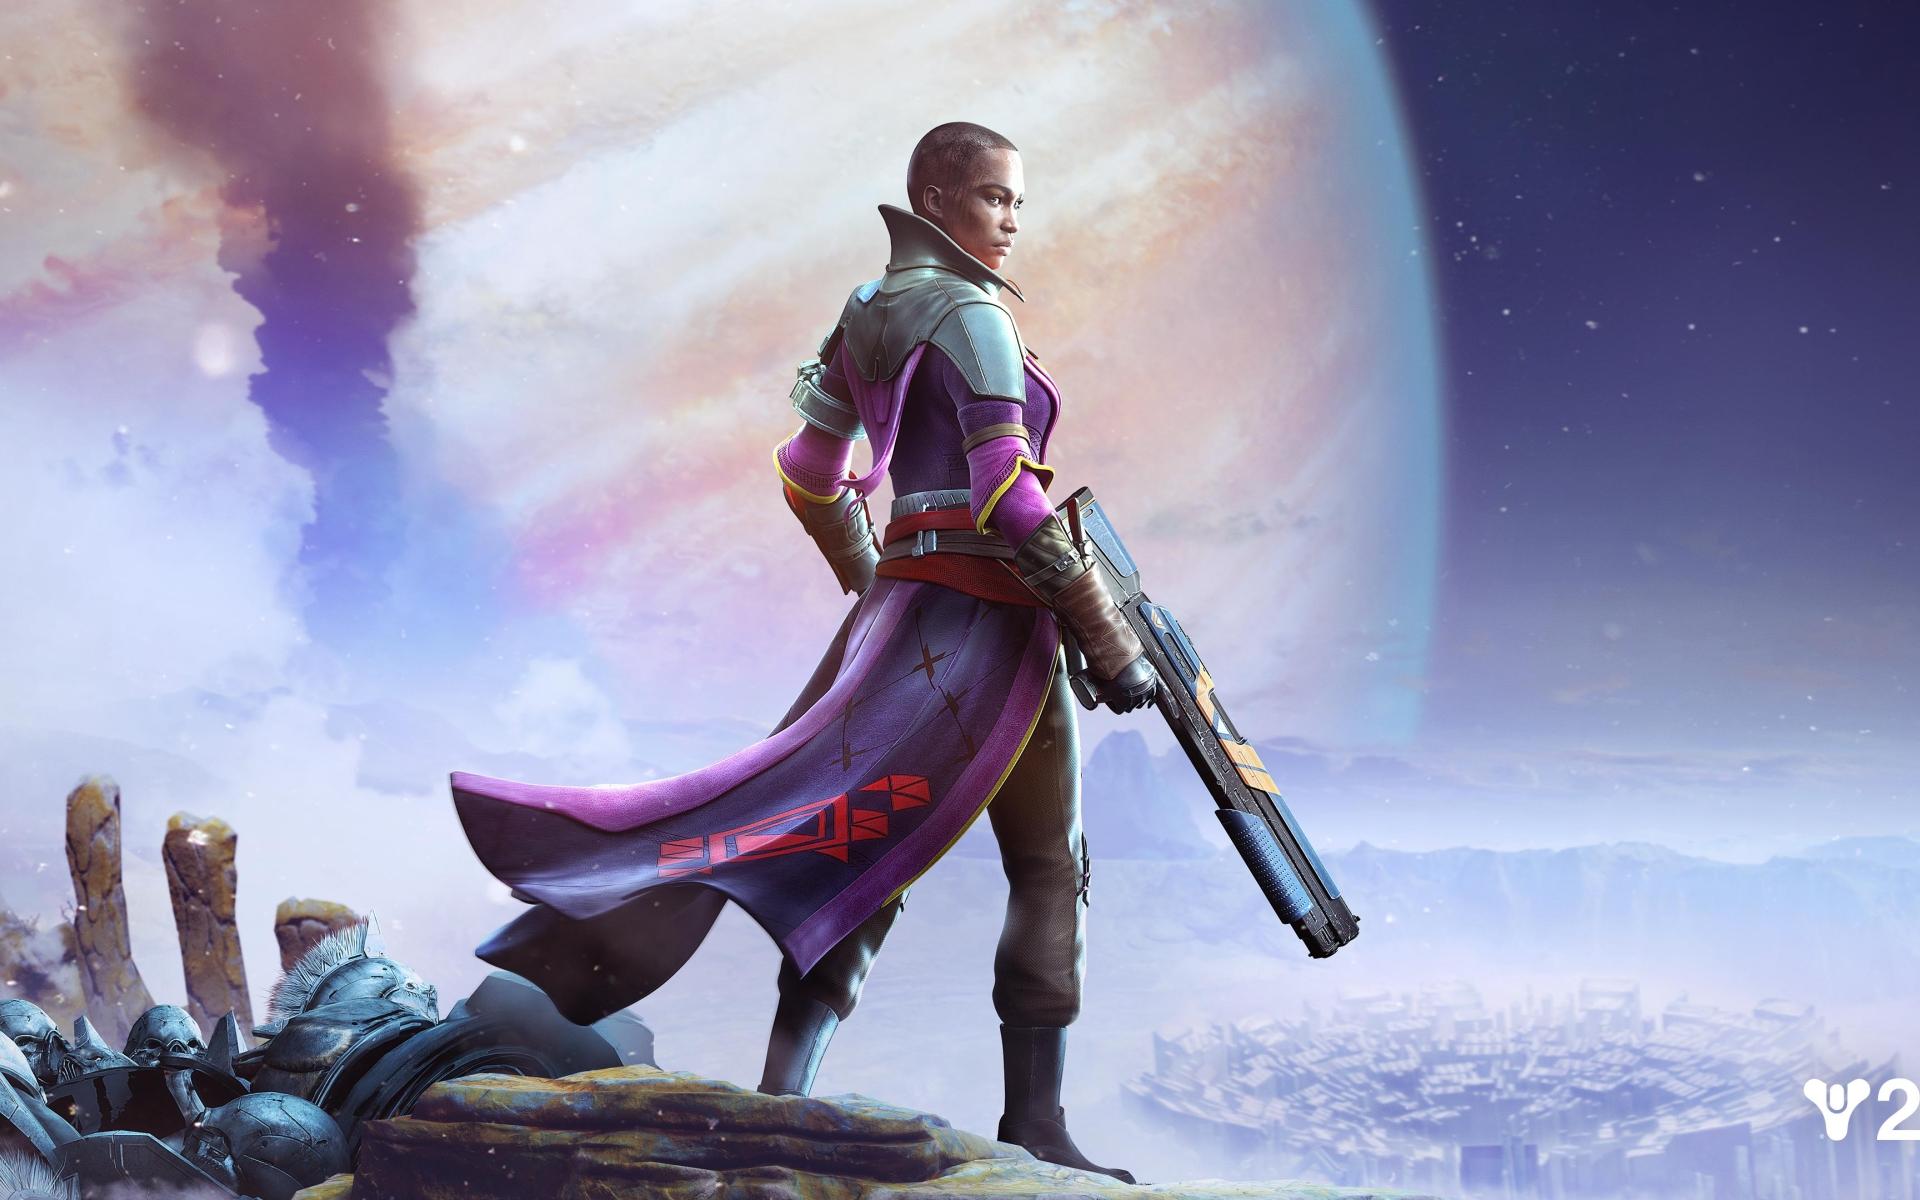 Destiny 2 Ikora Rey Hd 4k Wallpaper